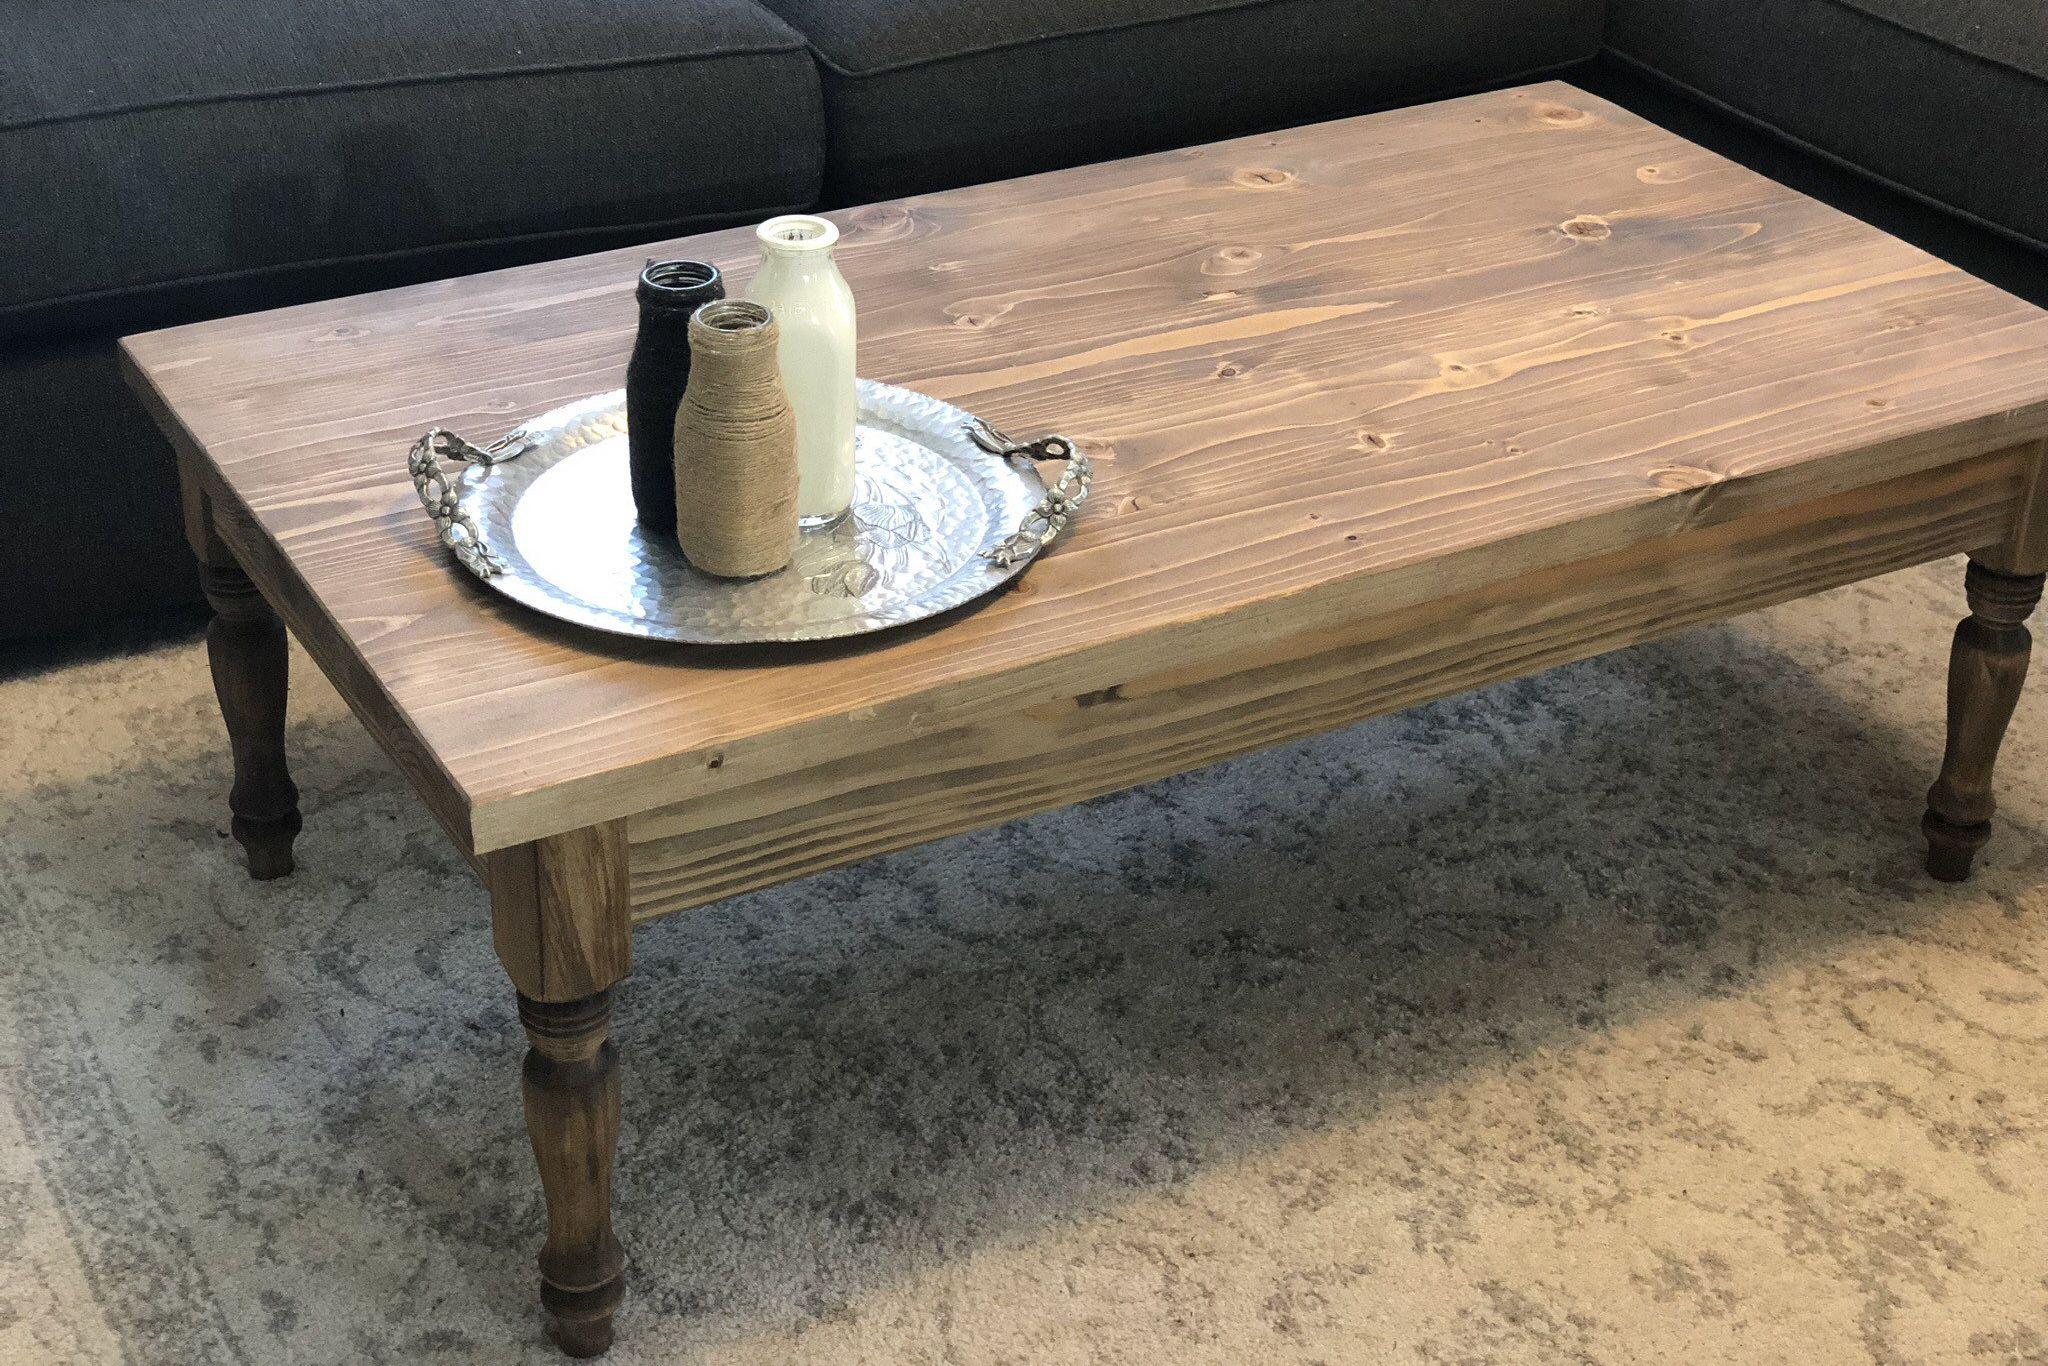 Turned Leg Rustic Coffee Table Rustic Furniture Farmhouse Furniture Farmhouse Coffee Table Brown Co Coffee Table Farmhouse Farmhouse Furniture Coffee Table